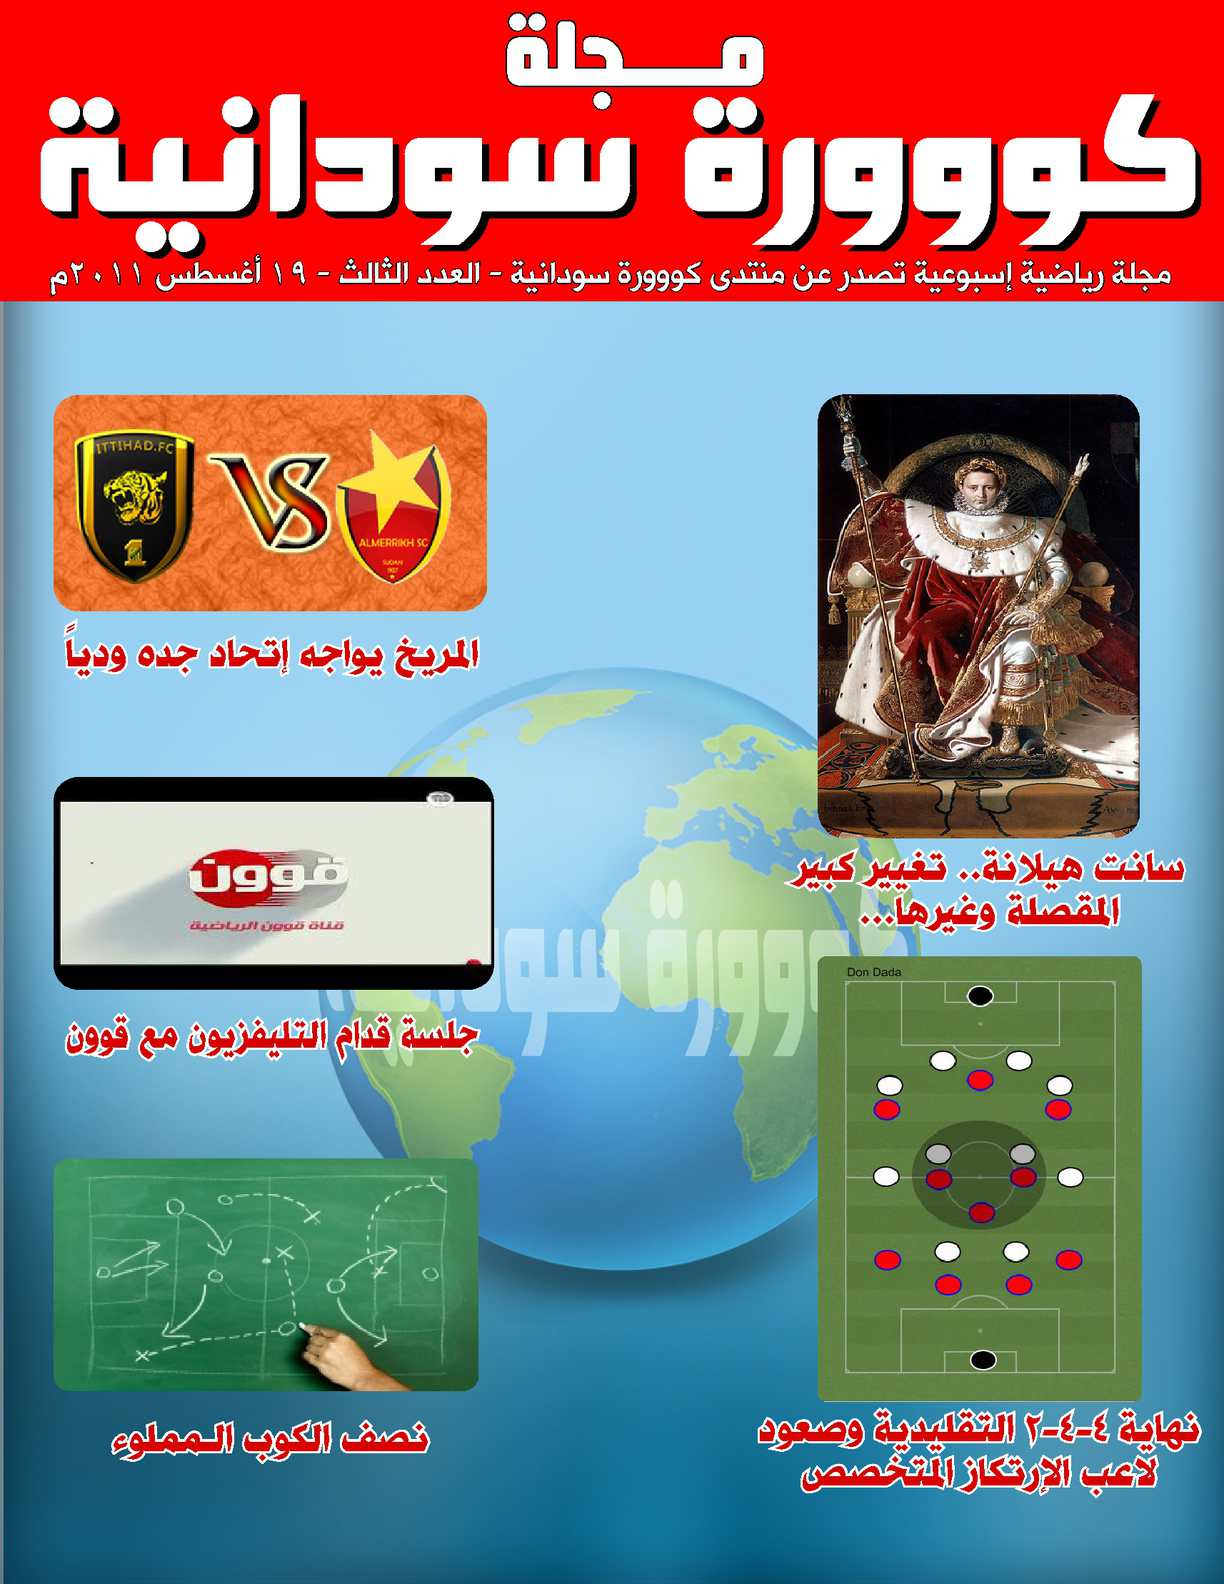 Calameo Kooora Sudania Magazine Issue 3